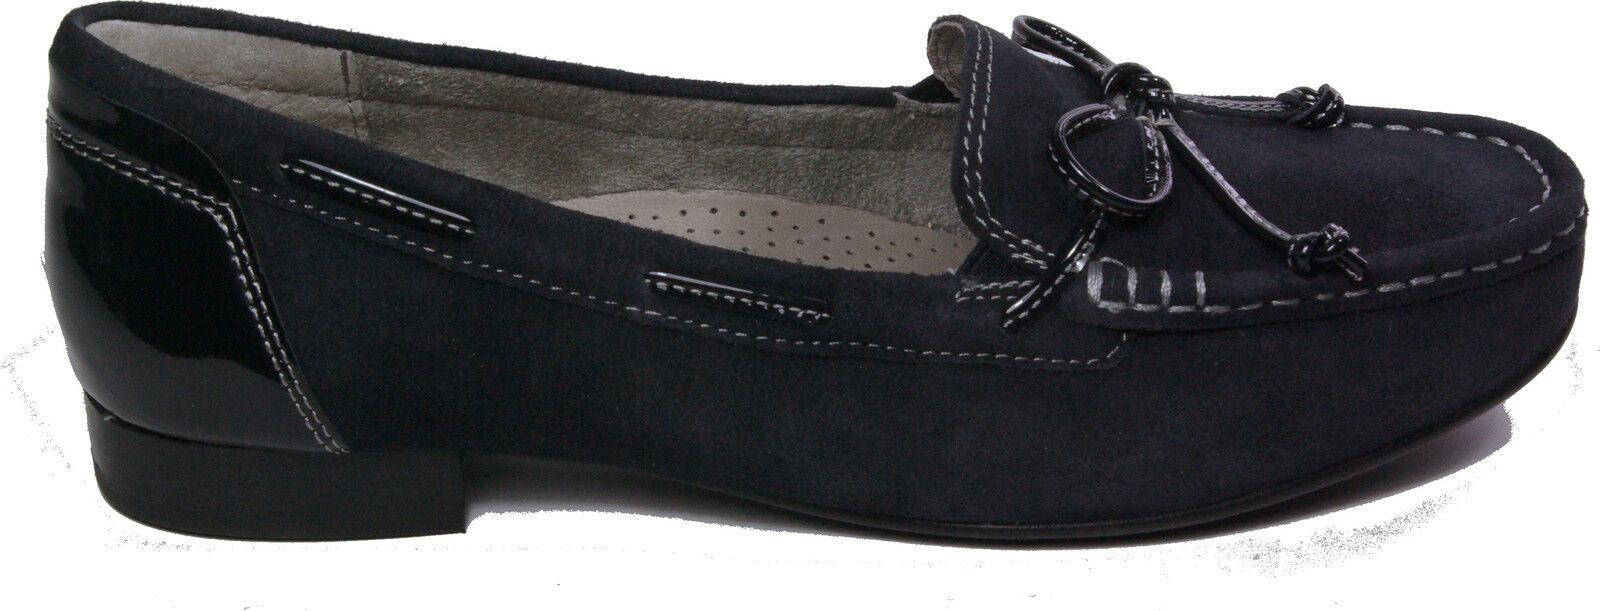 GABOR Schuhe Pumps Mokassin blau Nubuk echt Leder Nubuk blau Lack Weite G NEU 7469e9